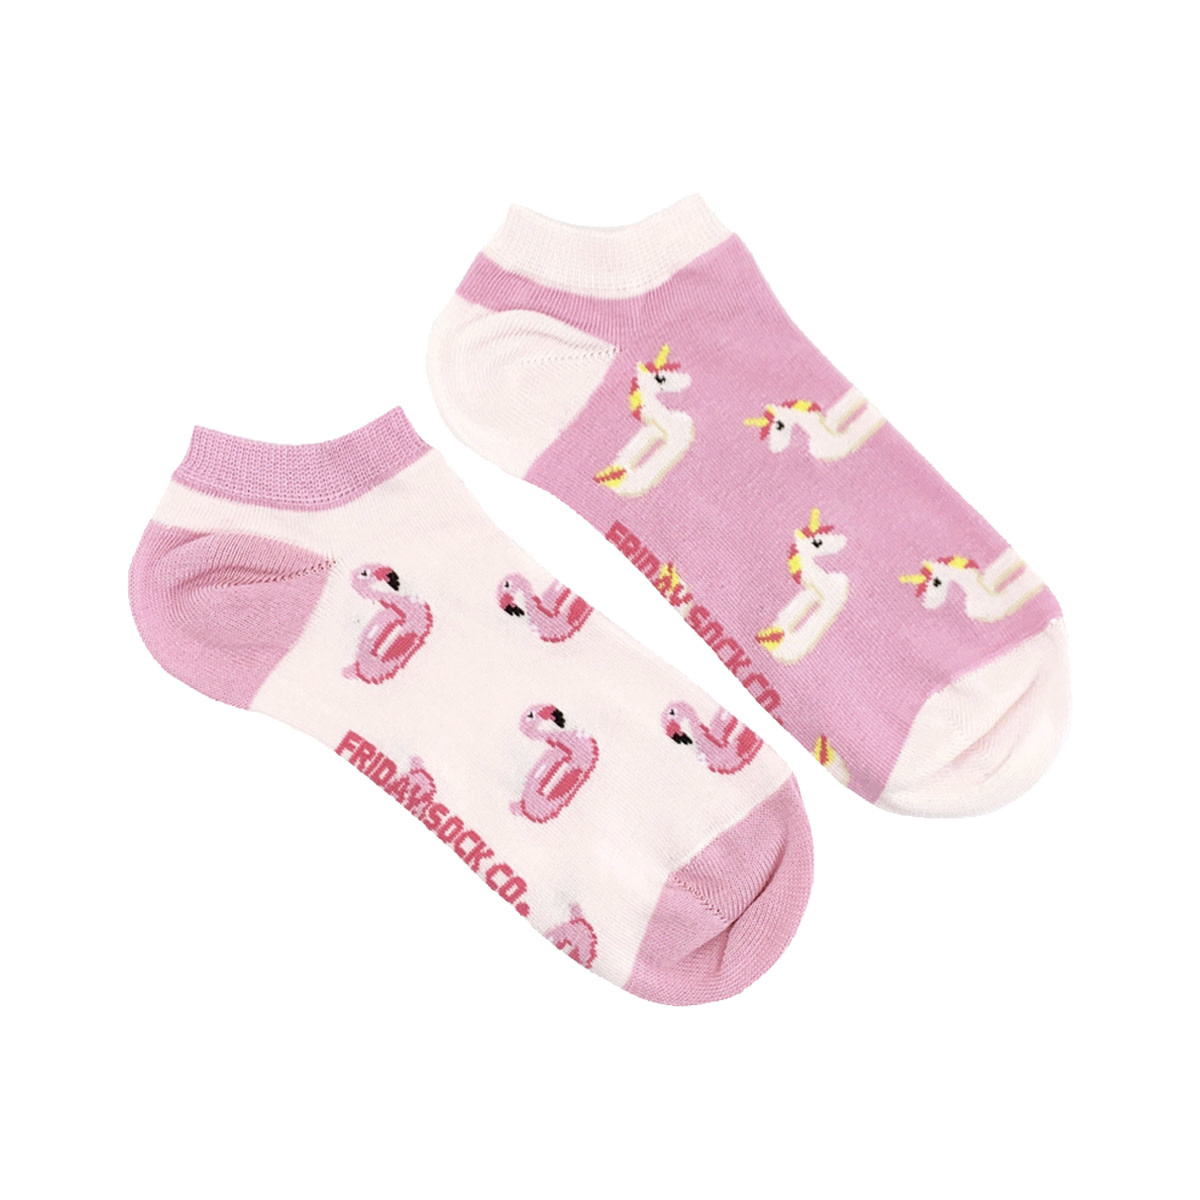 Friday Sock Co. Friday Sock Co. Women's Unicorn & Flamingo Ankle W 5 - 10 (M - 4 - 8)